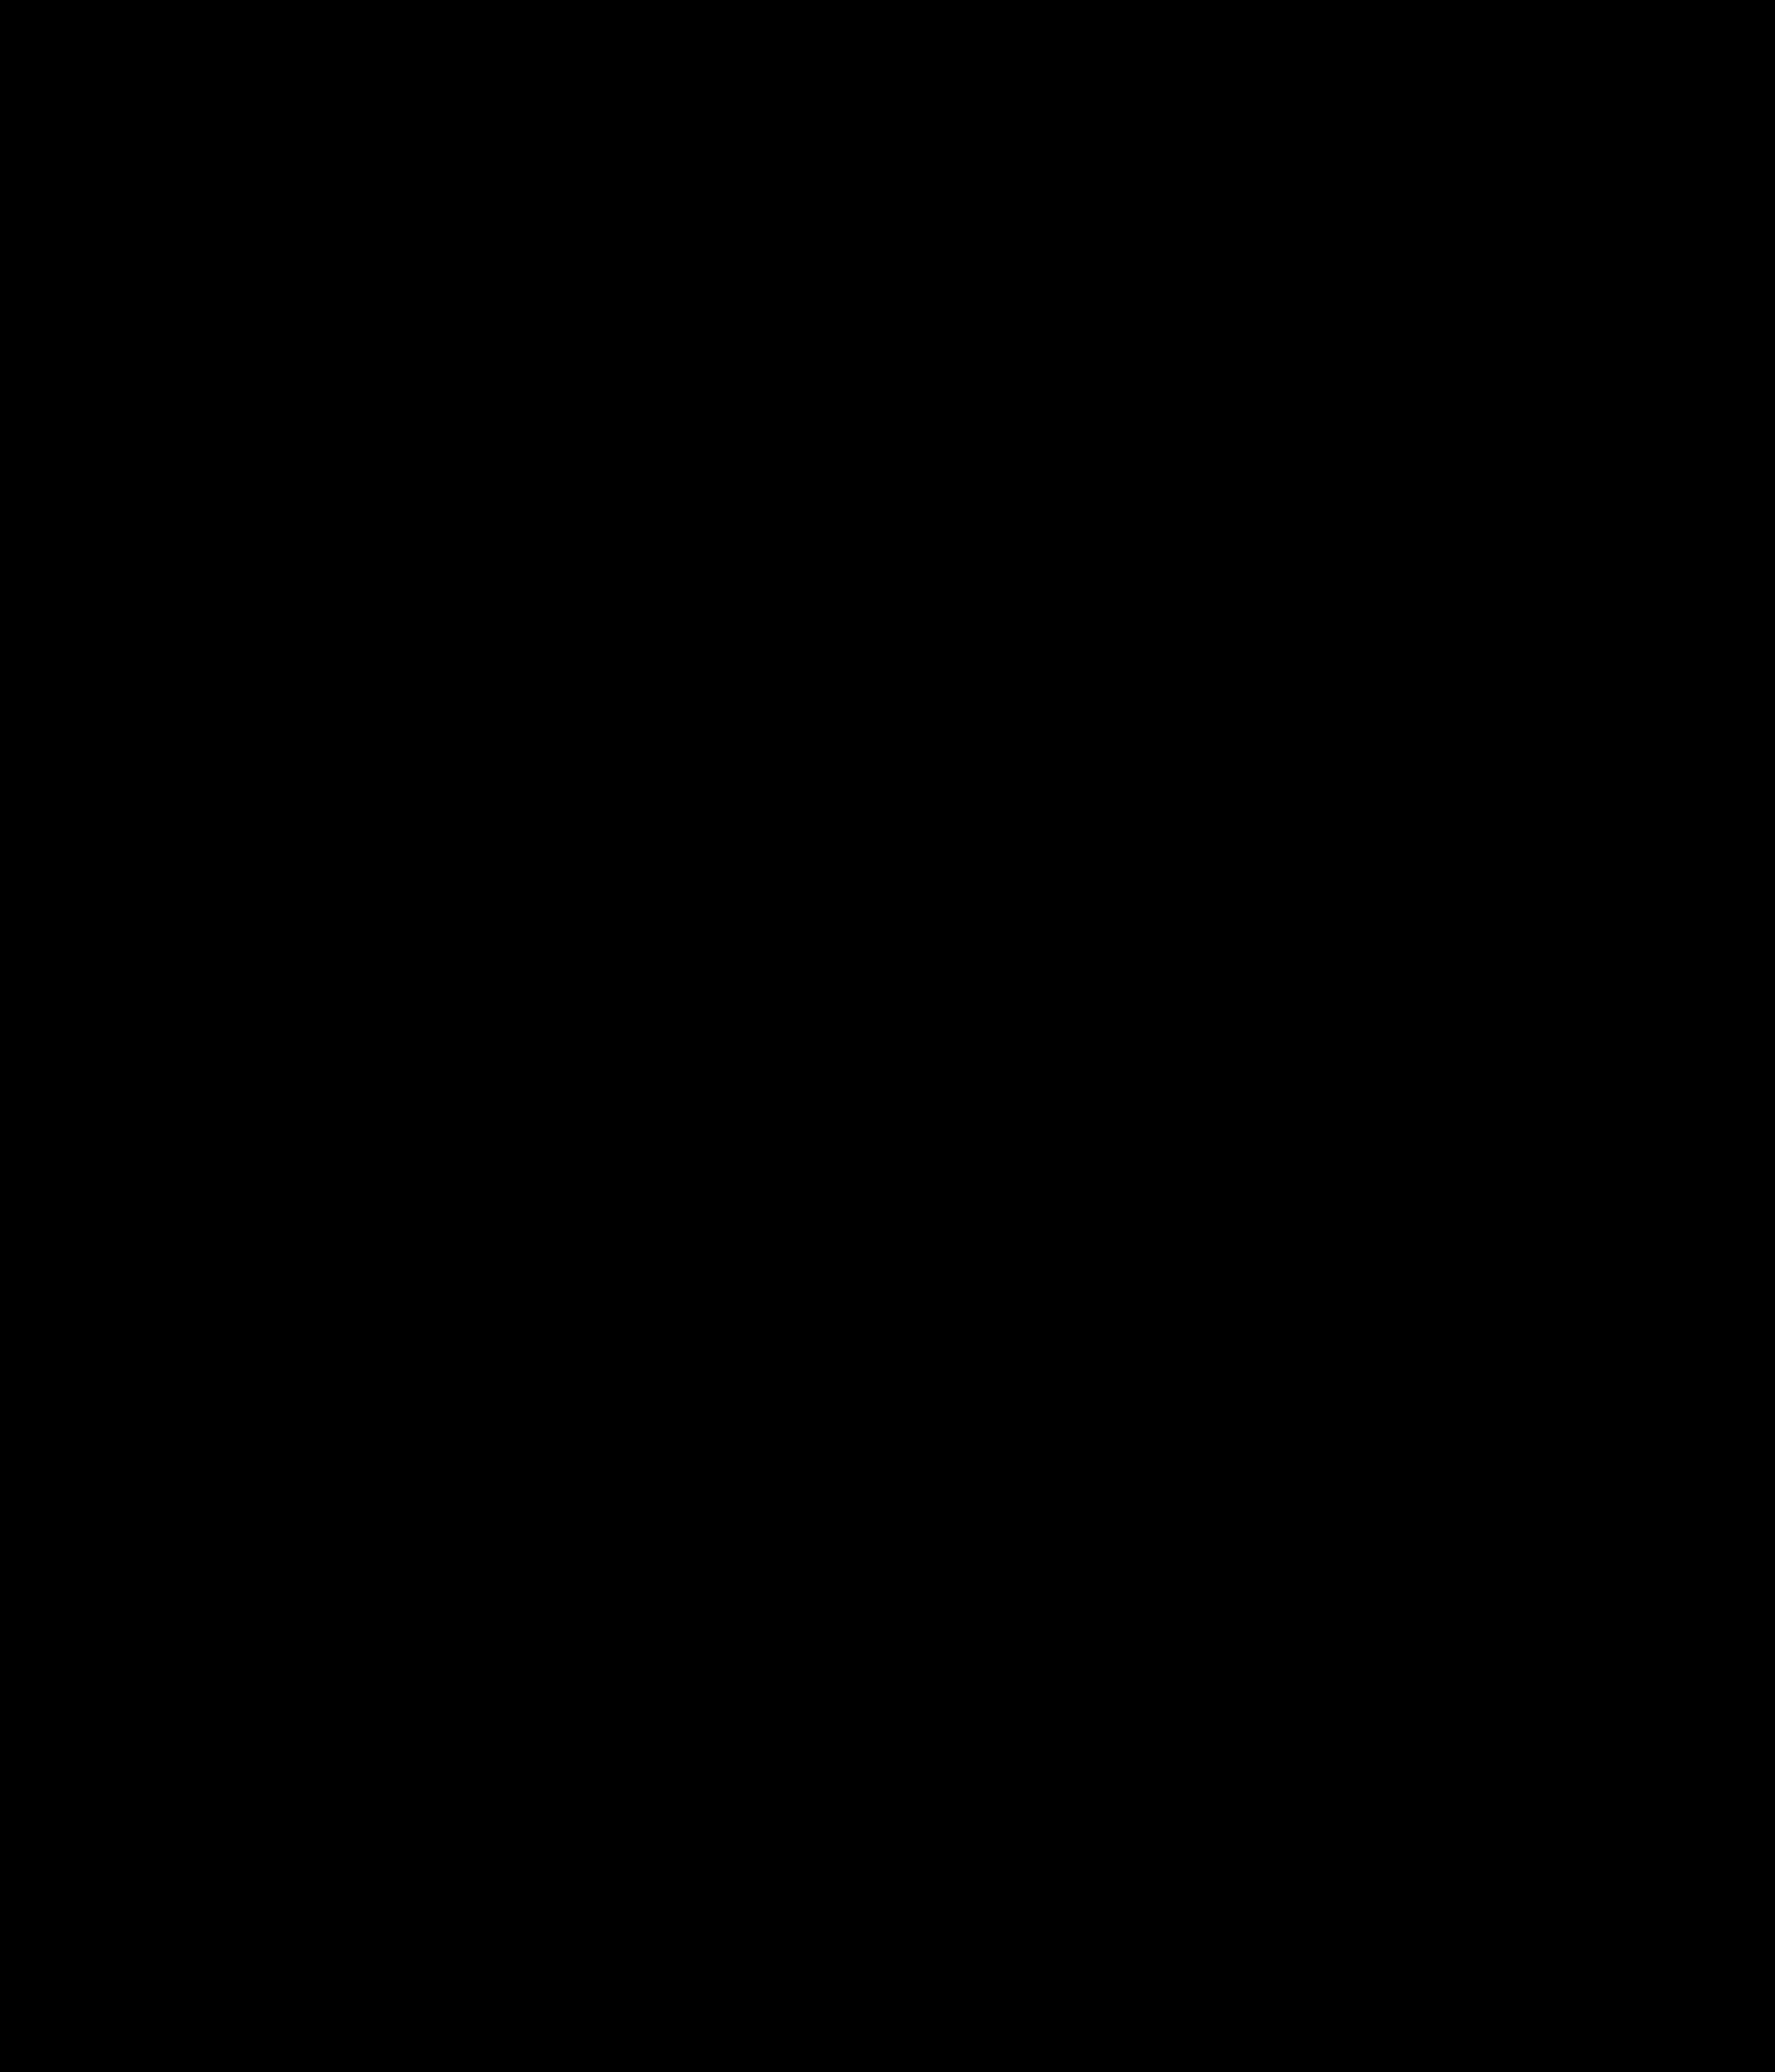 Avengers clipart symbol. File from marvel s